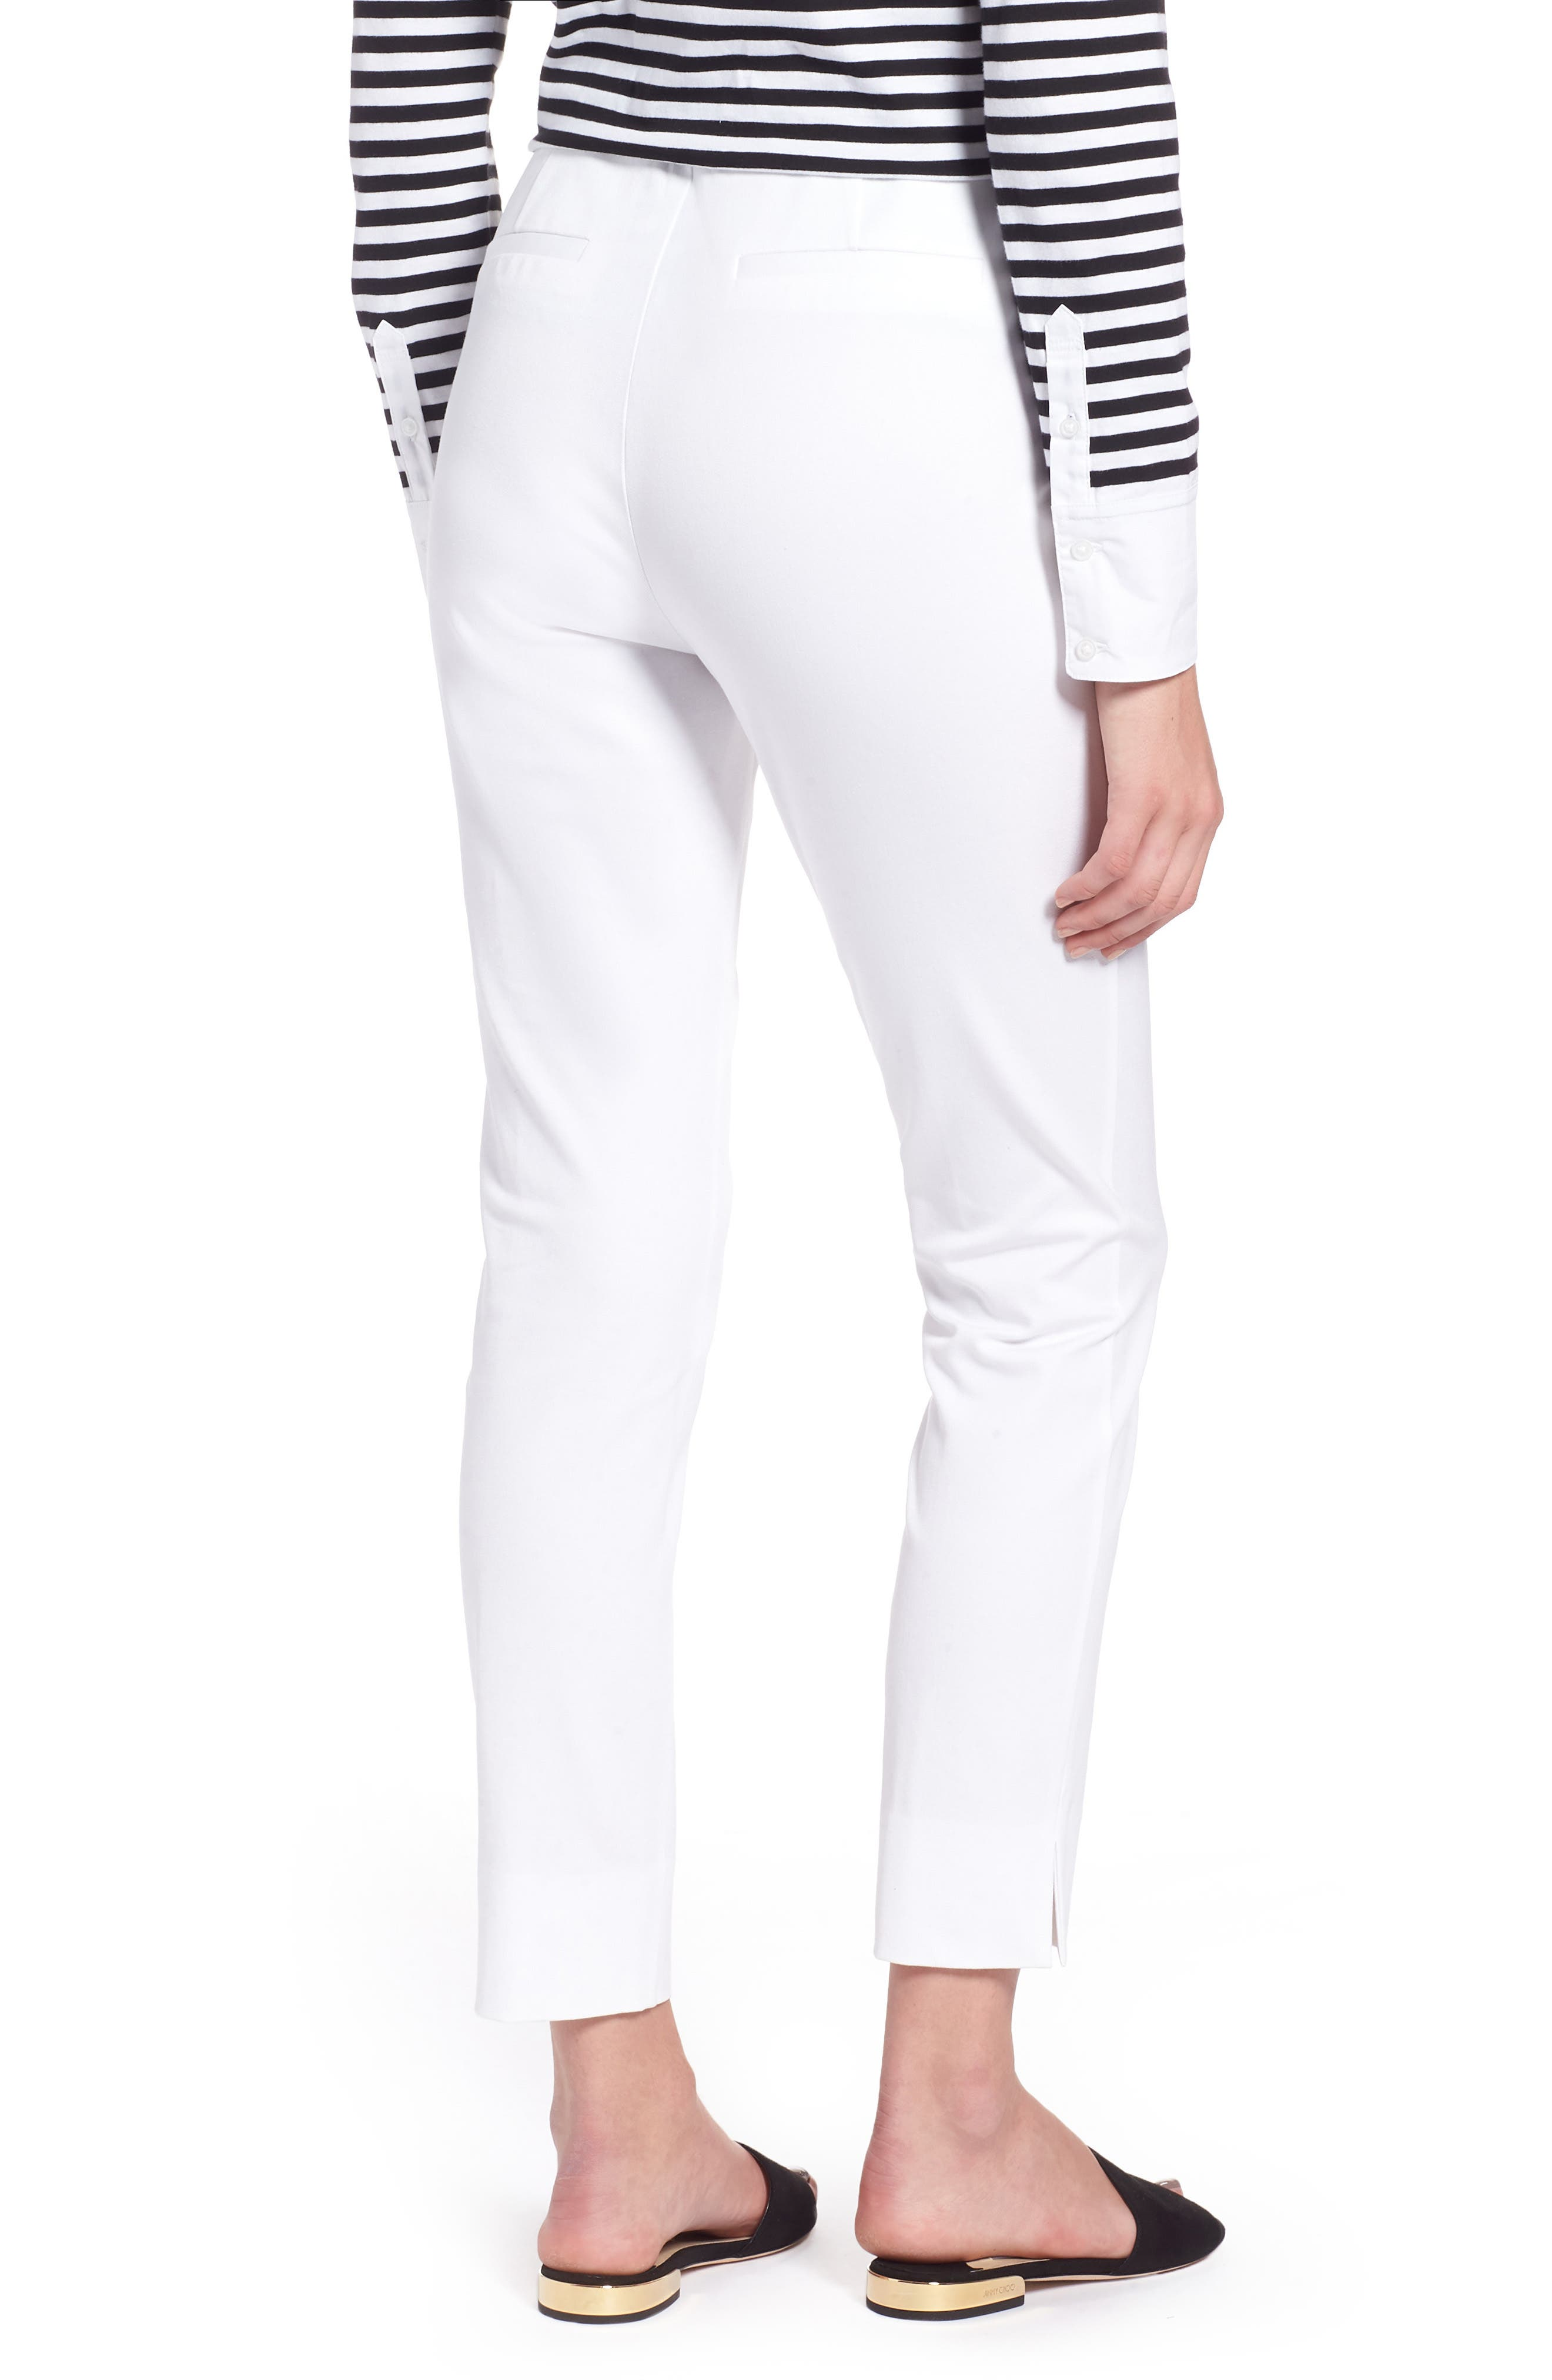 Skinny Stretch Pants,                             Alternate thumbnail 2, color,                             WHITE